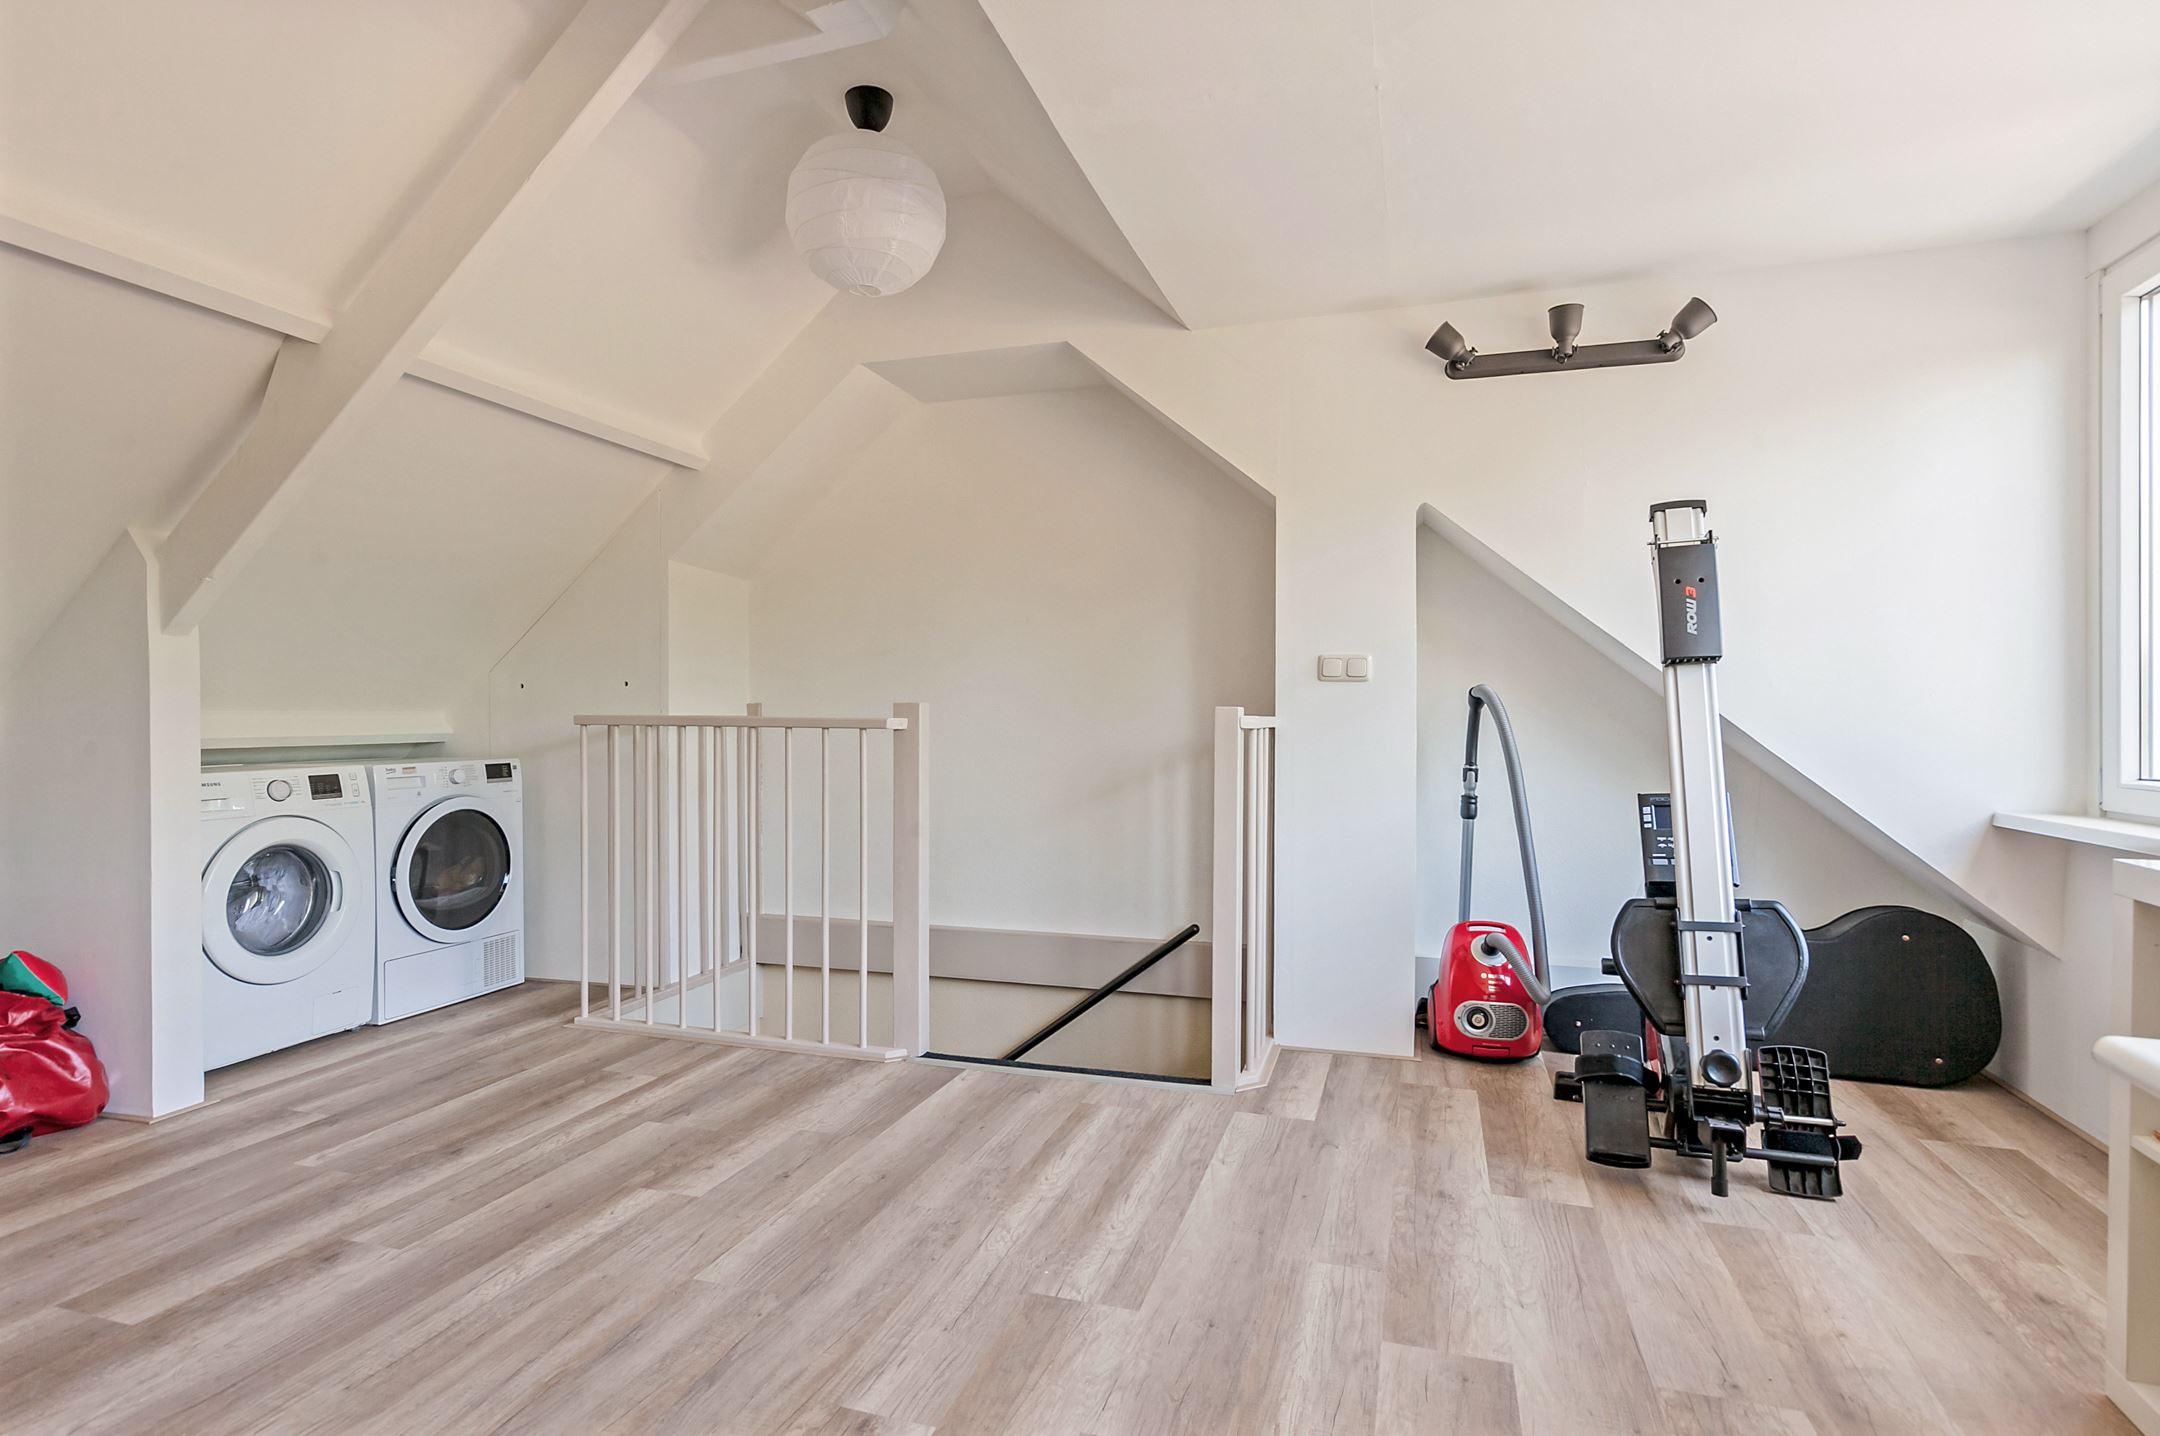 House - attic.jpg